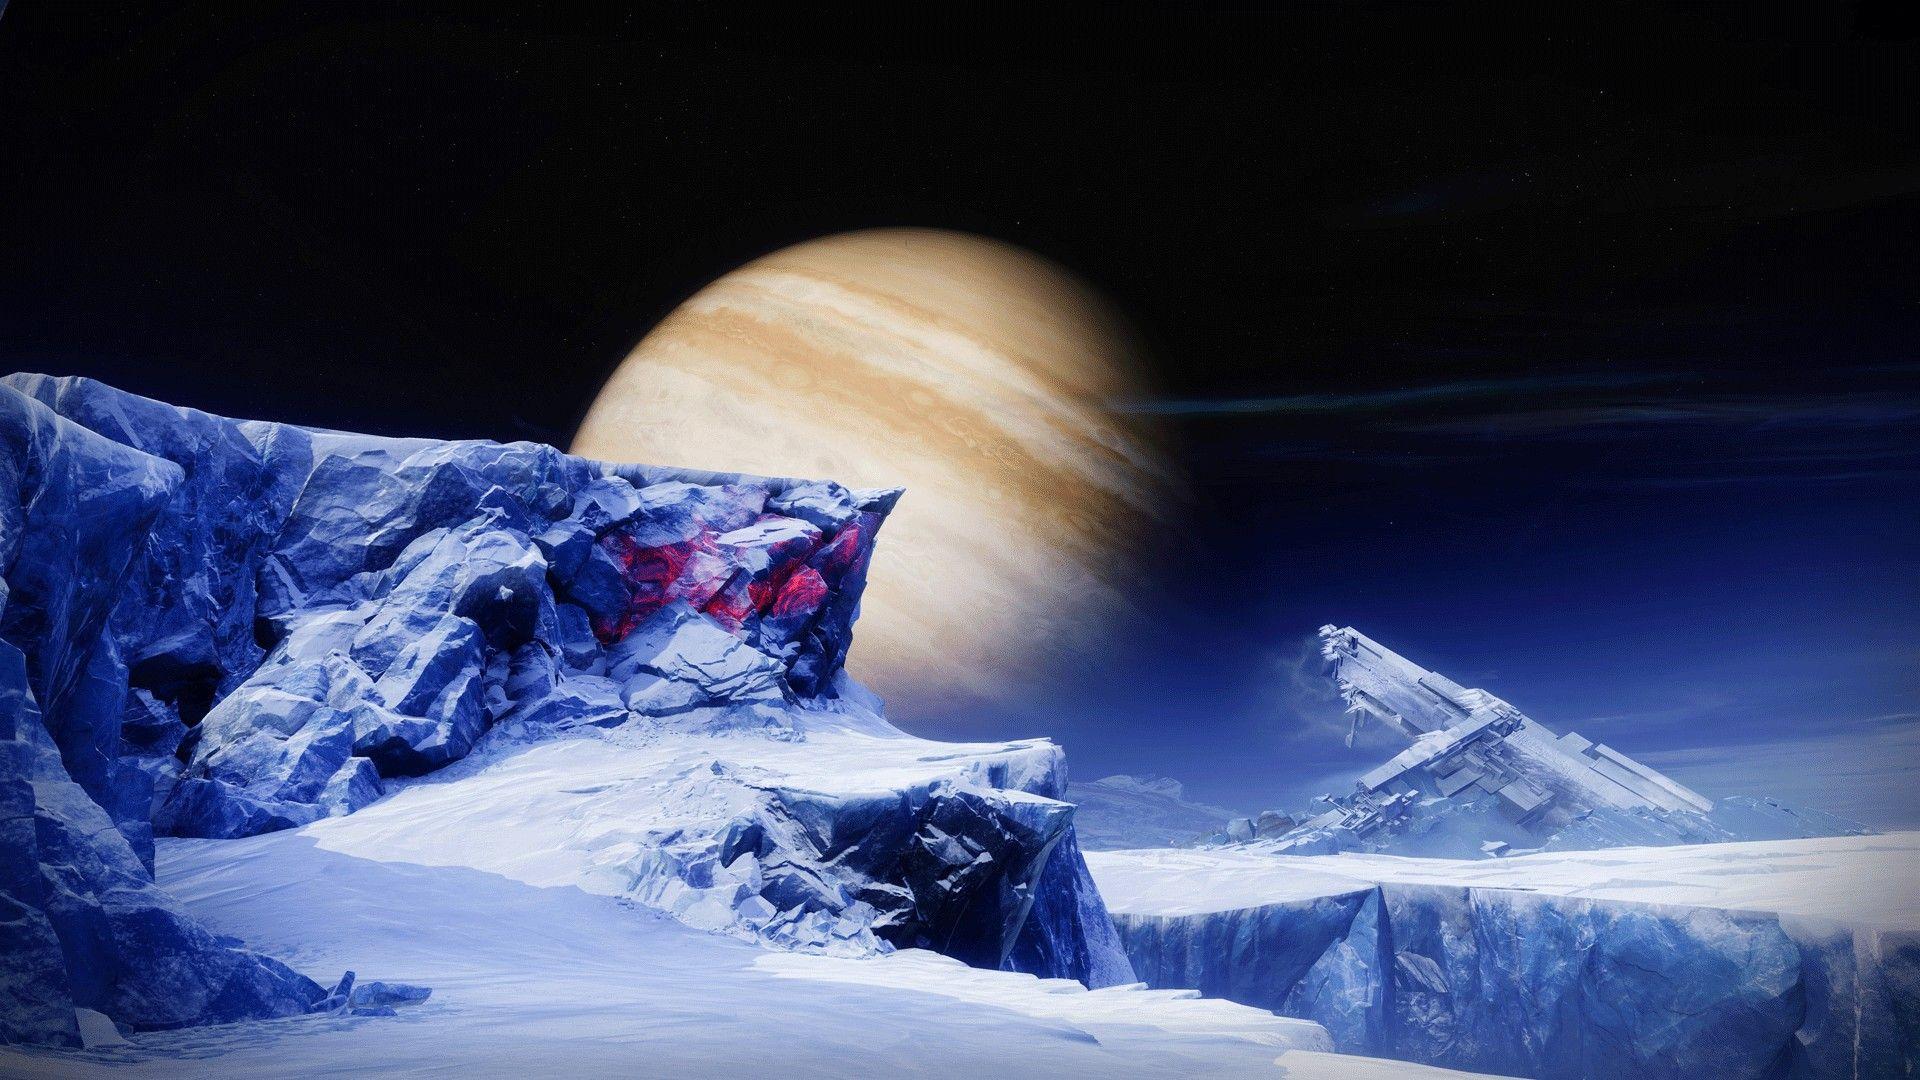 Destiny 2 Beyond Light Deluxe Edition In 2020 Dark Empire Beyond The Lights Destiny